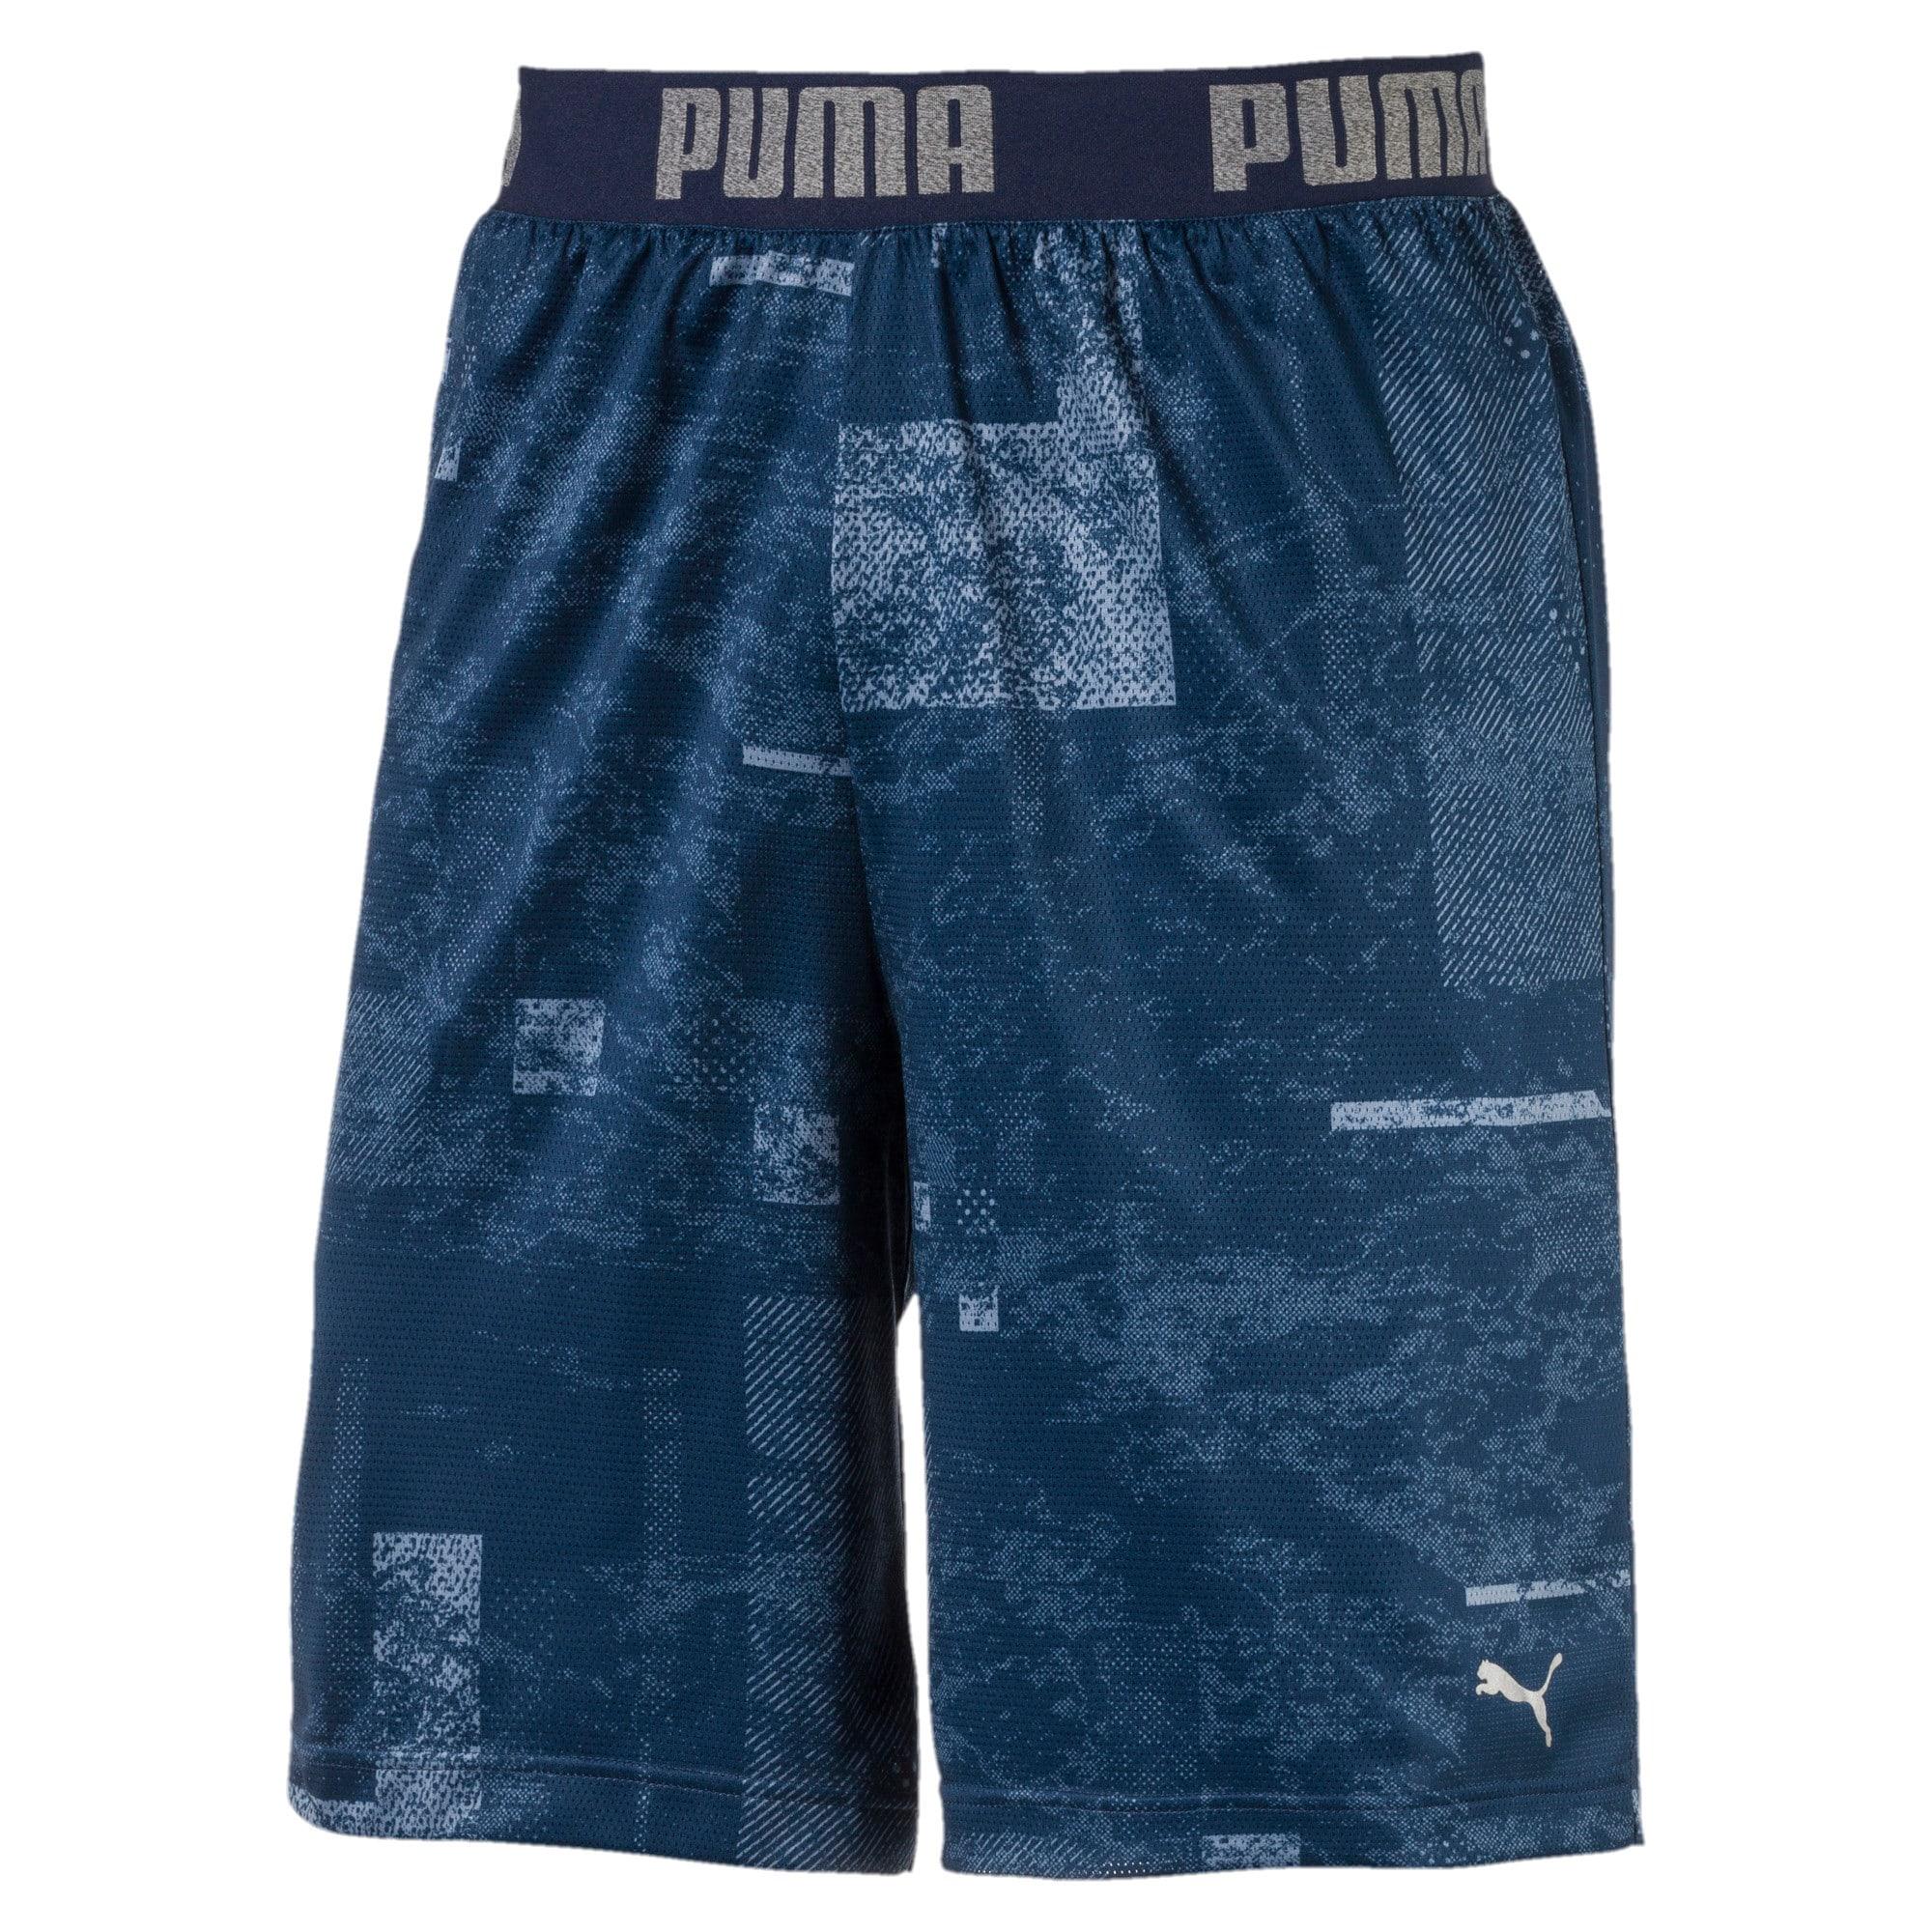 Thumbnail 3 of Active Training Men's Reversible Shorts, Infinity-Sargasso Sea, medium-IND